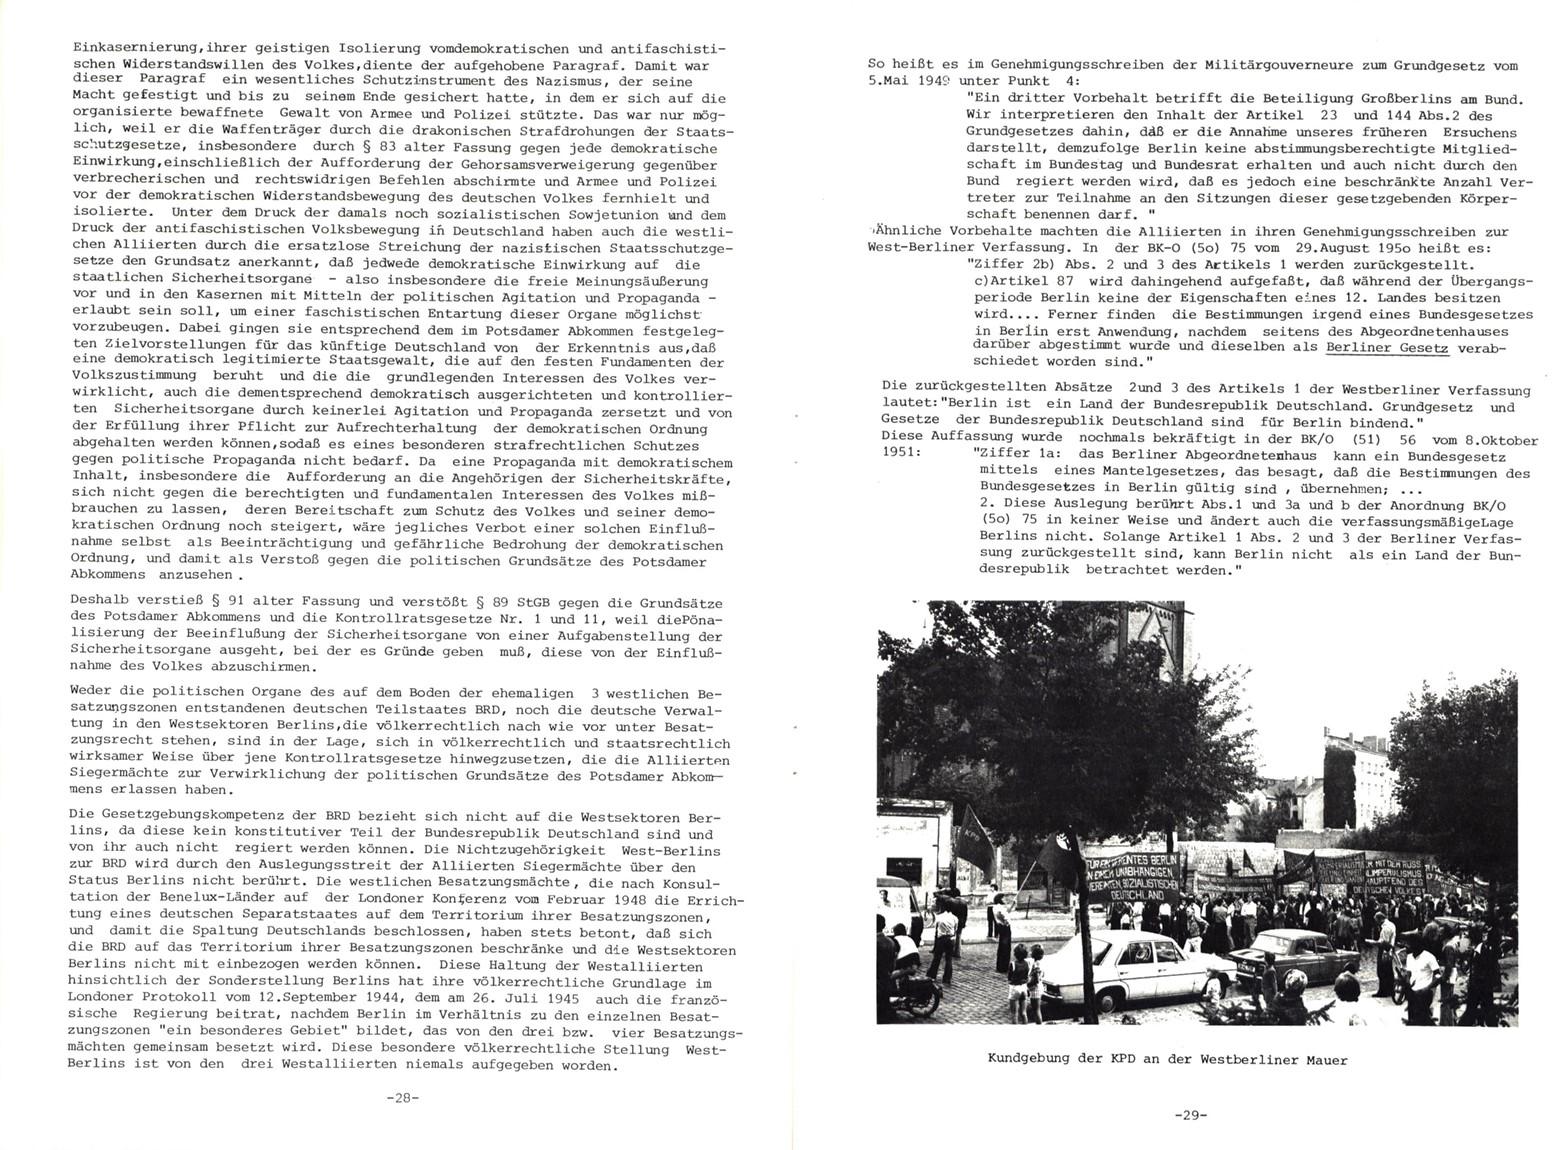 KPDAO_1976_Staatsschutzparagrafen_15